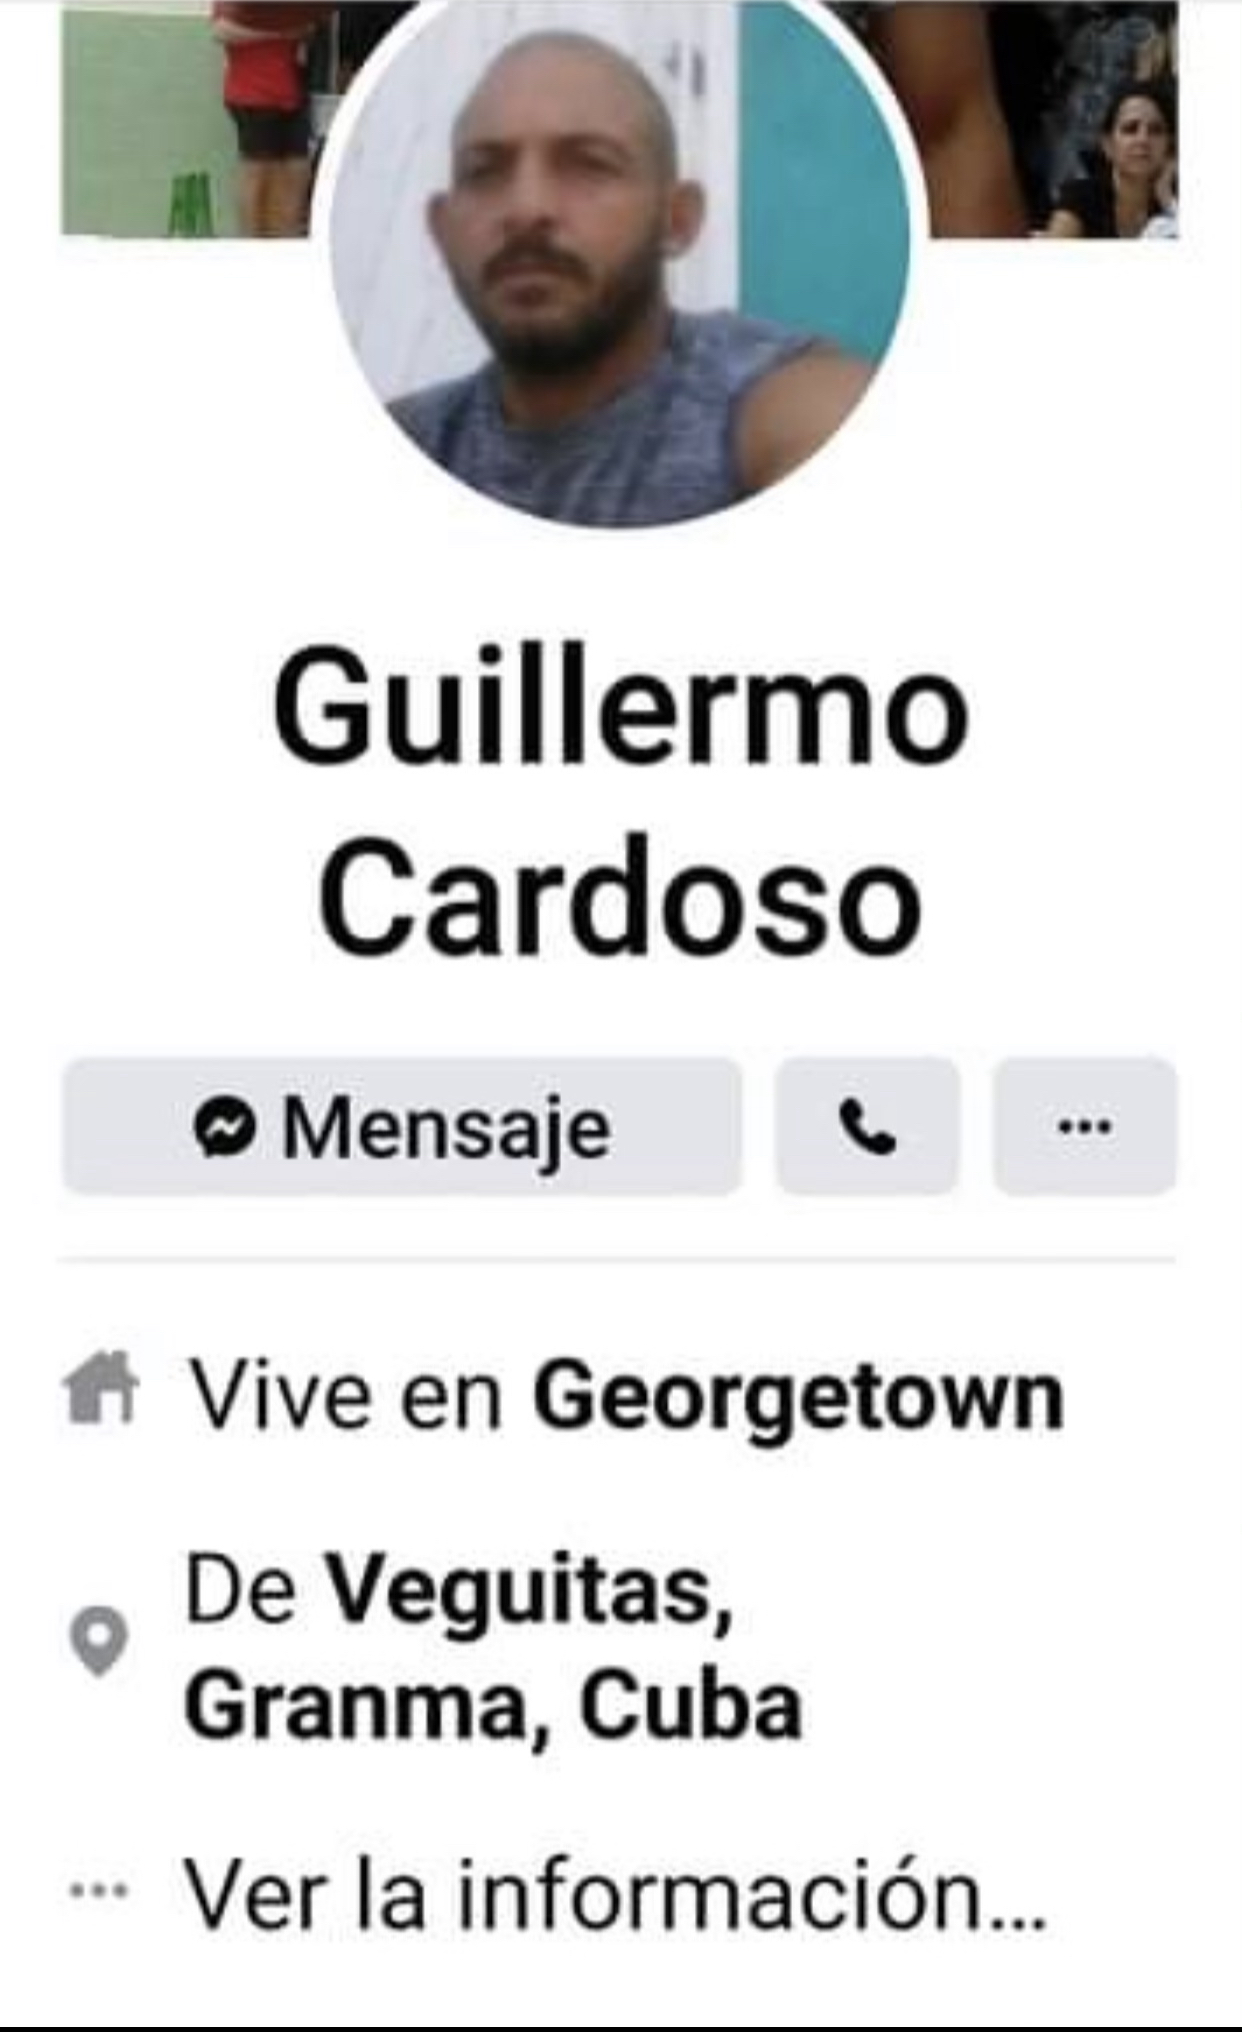 Guillermo Cardoso